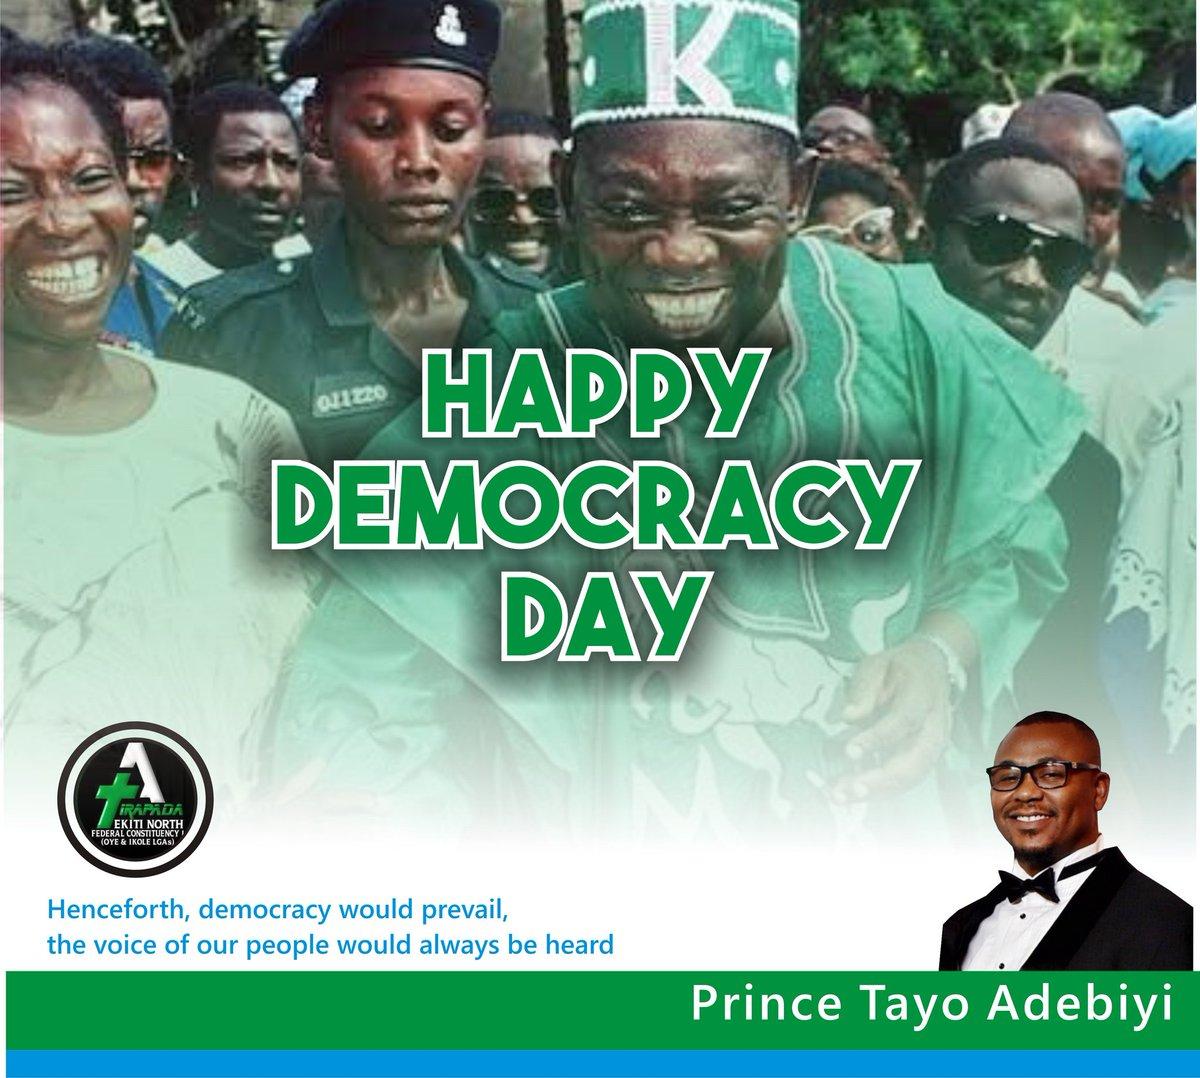 Congratulations Nigeria! Our freedom to choose is worth celebrating! #HappyDemocracyDay   @NGRPresident @MBuhari @NGRSenate @nassnigeria @AsiwajuTinubu @ProfOsinbajo @GovEkiti @kfayemi @bisiafayemi @femigbaja @purrples @Mofiobafemi @jidesanwoolu @dabiodunMFR @HFatoba @BafemEkiti<br>http://pic.twitter.com/mFC13tKkd2